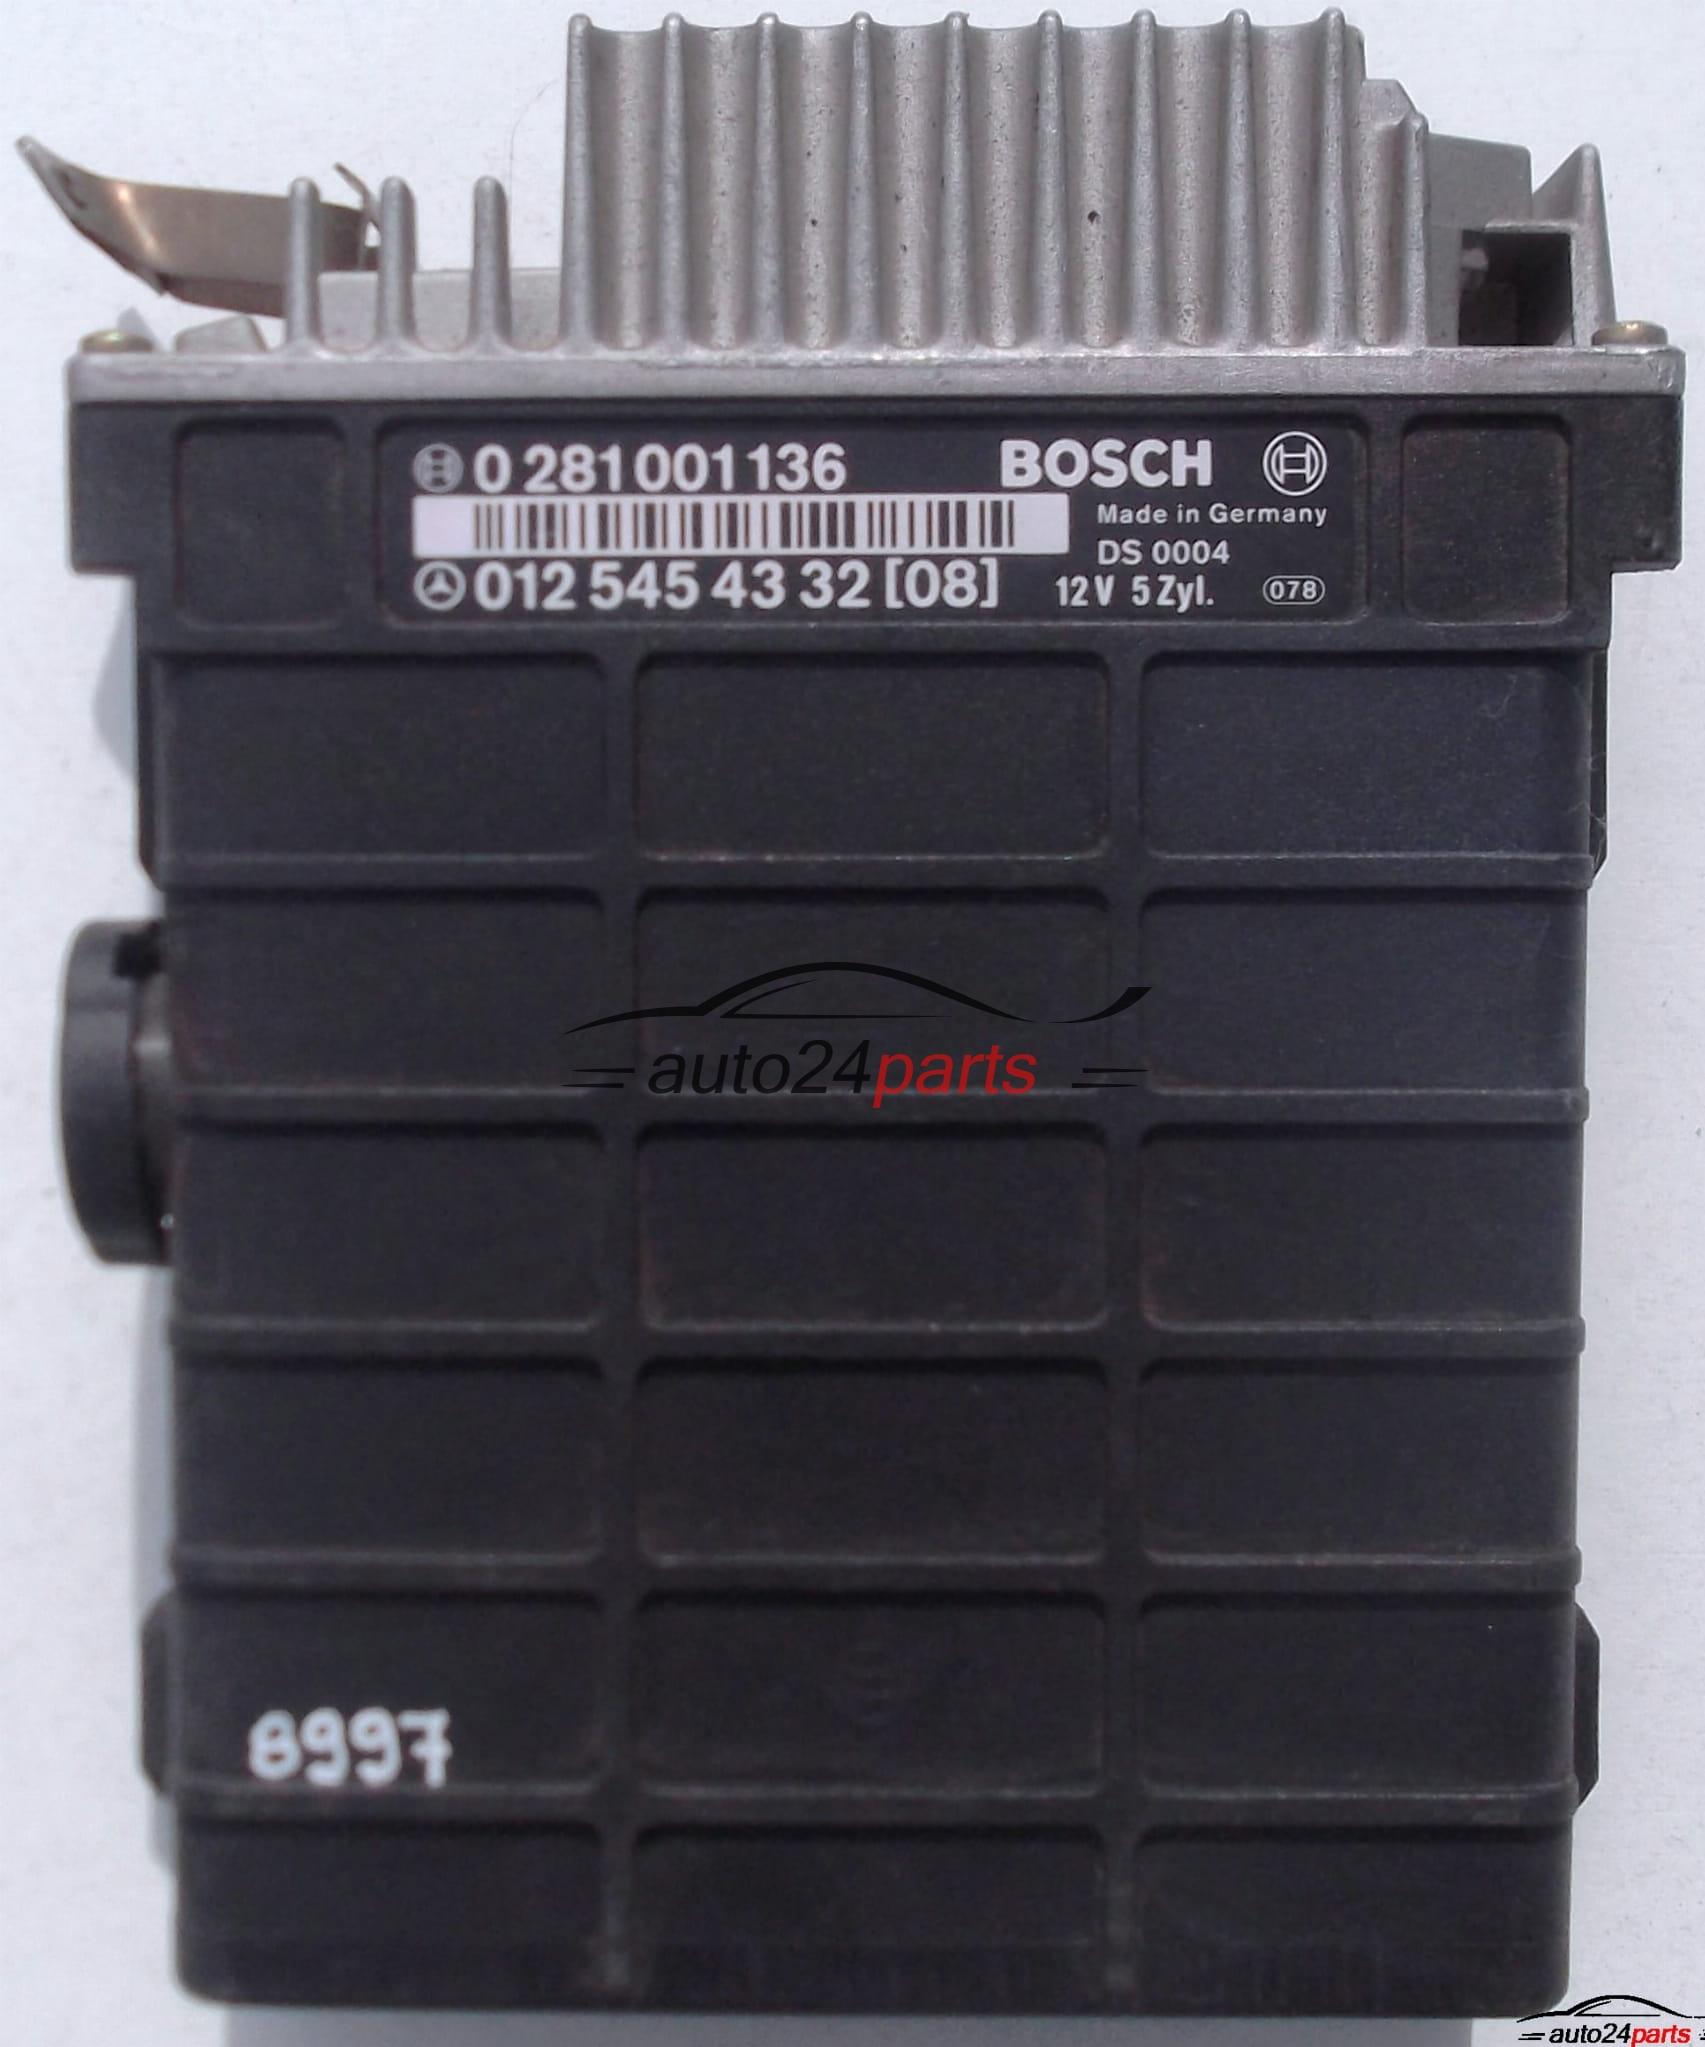 ECU ENGINE CONTROLLER MERCEDES W124 2 5, BOSCH 0 281 001 136, 0281001136,  012 545 43 32, 0125454332[08] - 8997